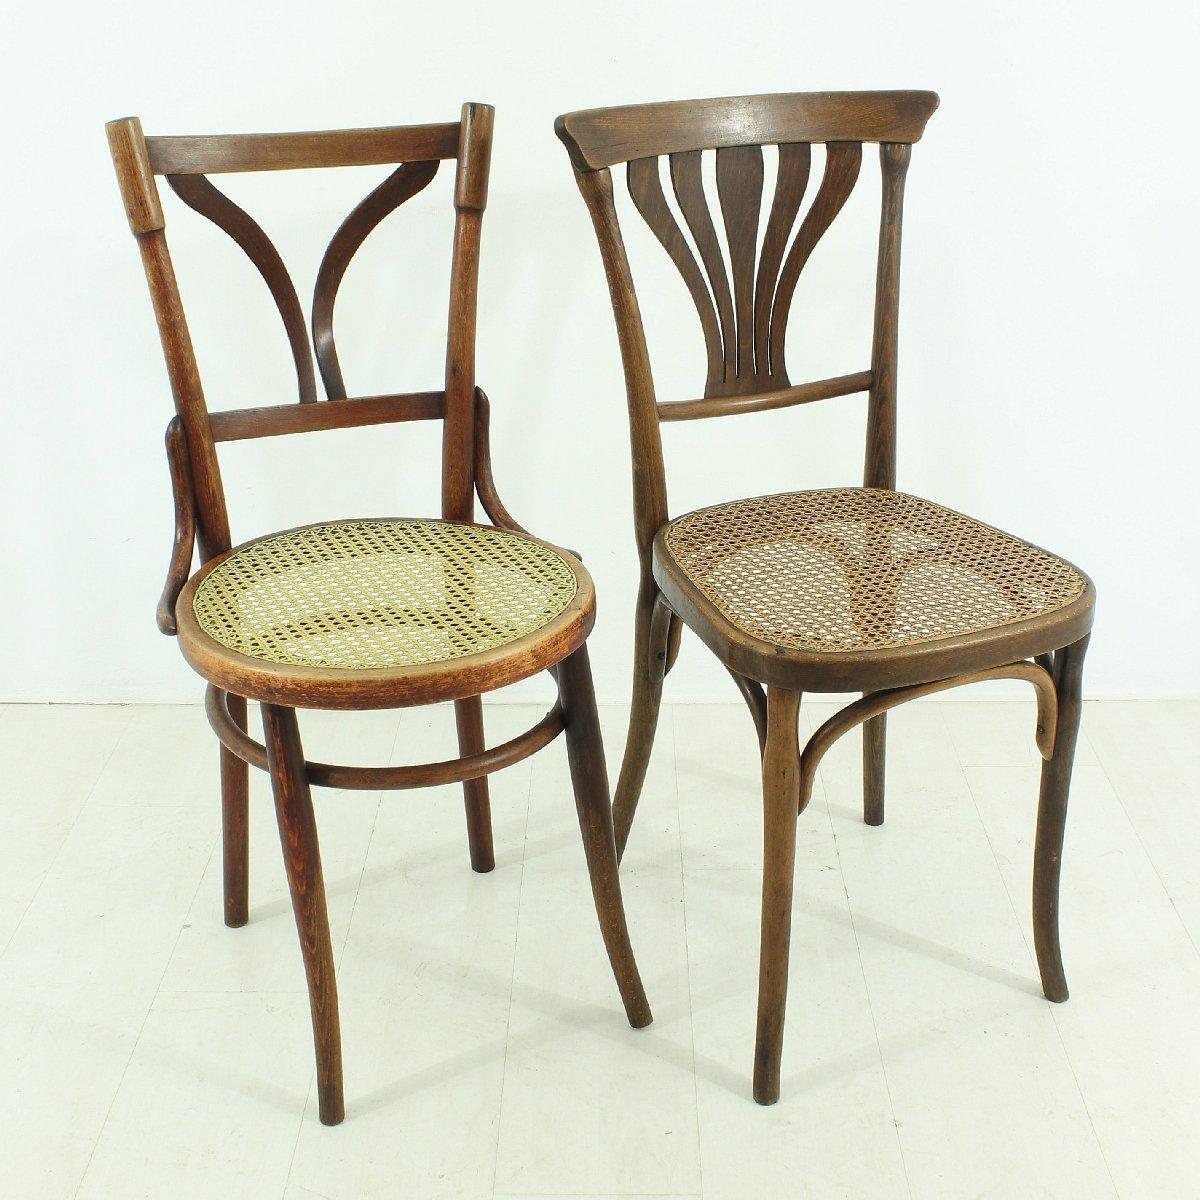 Antique Bentwood Bistro Chairs, Set of 2 - Antique Bentwood Bistro Chairs, Set Of 2 For Sale At Pamono